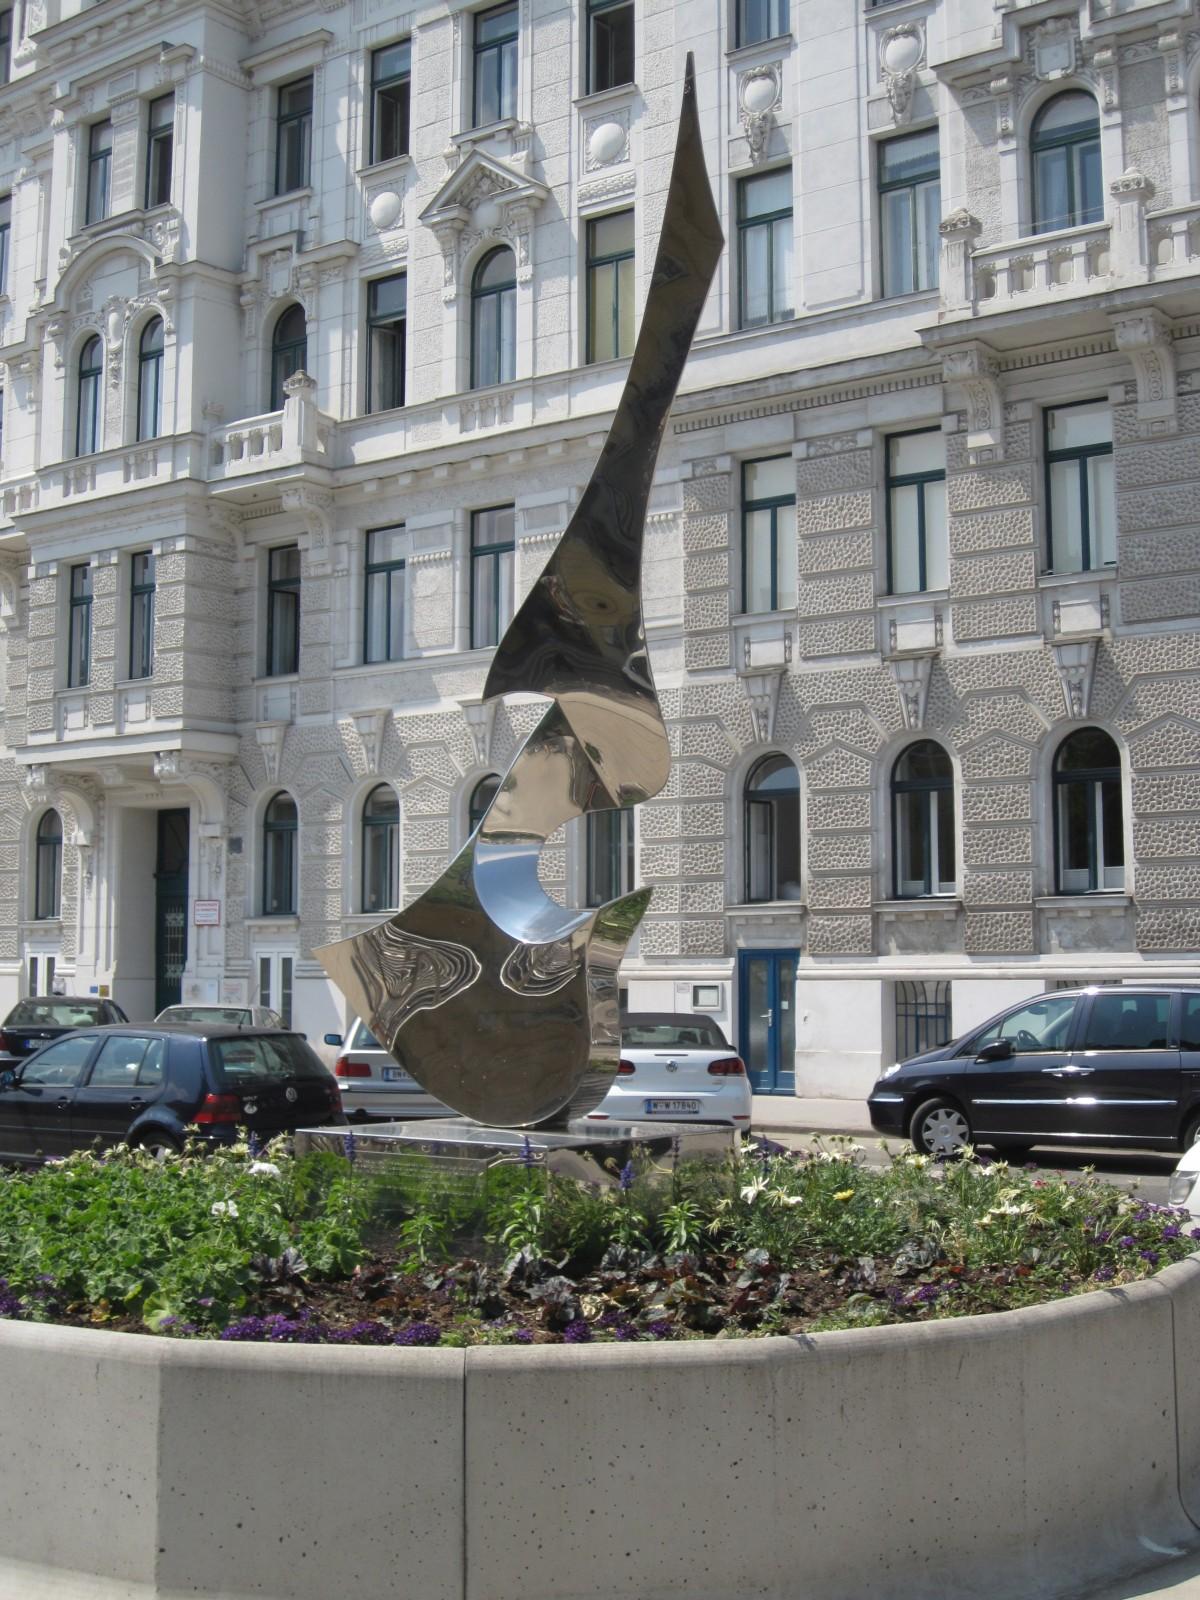 1030 Anton Webern-Platz - Metallskulptur Musica von Leonardo Nierman IMG 7198.jpg